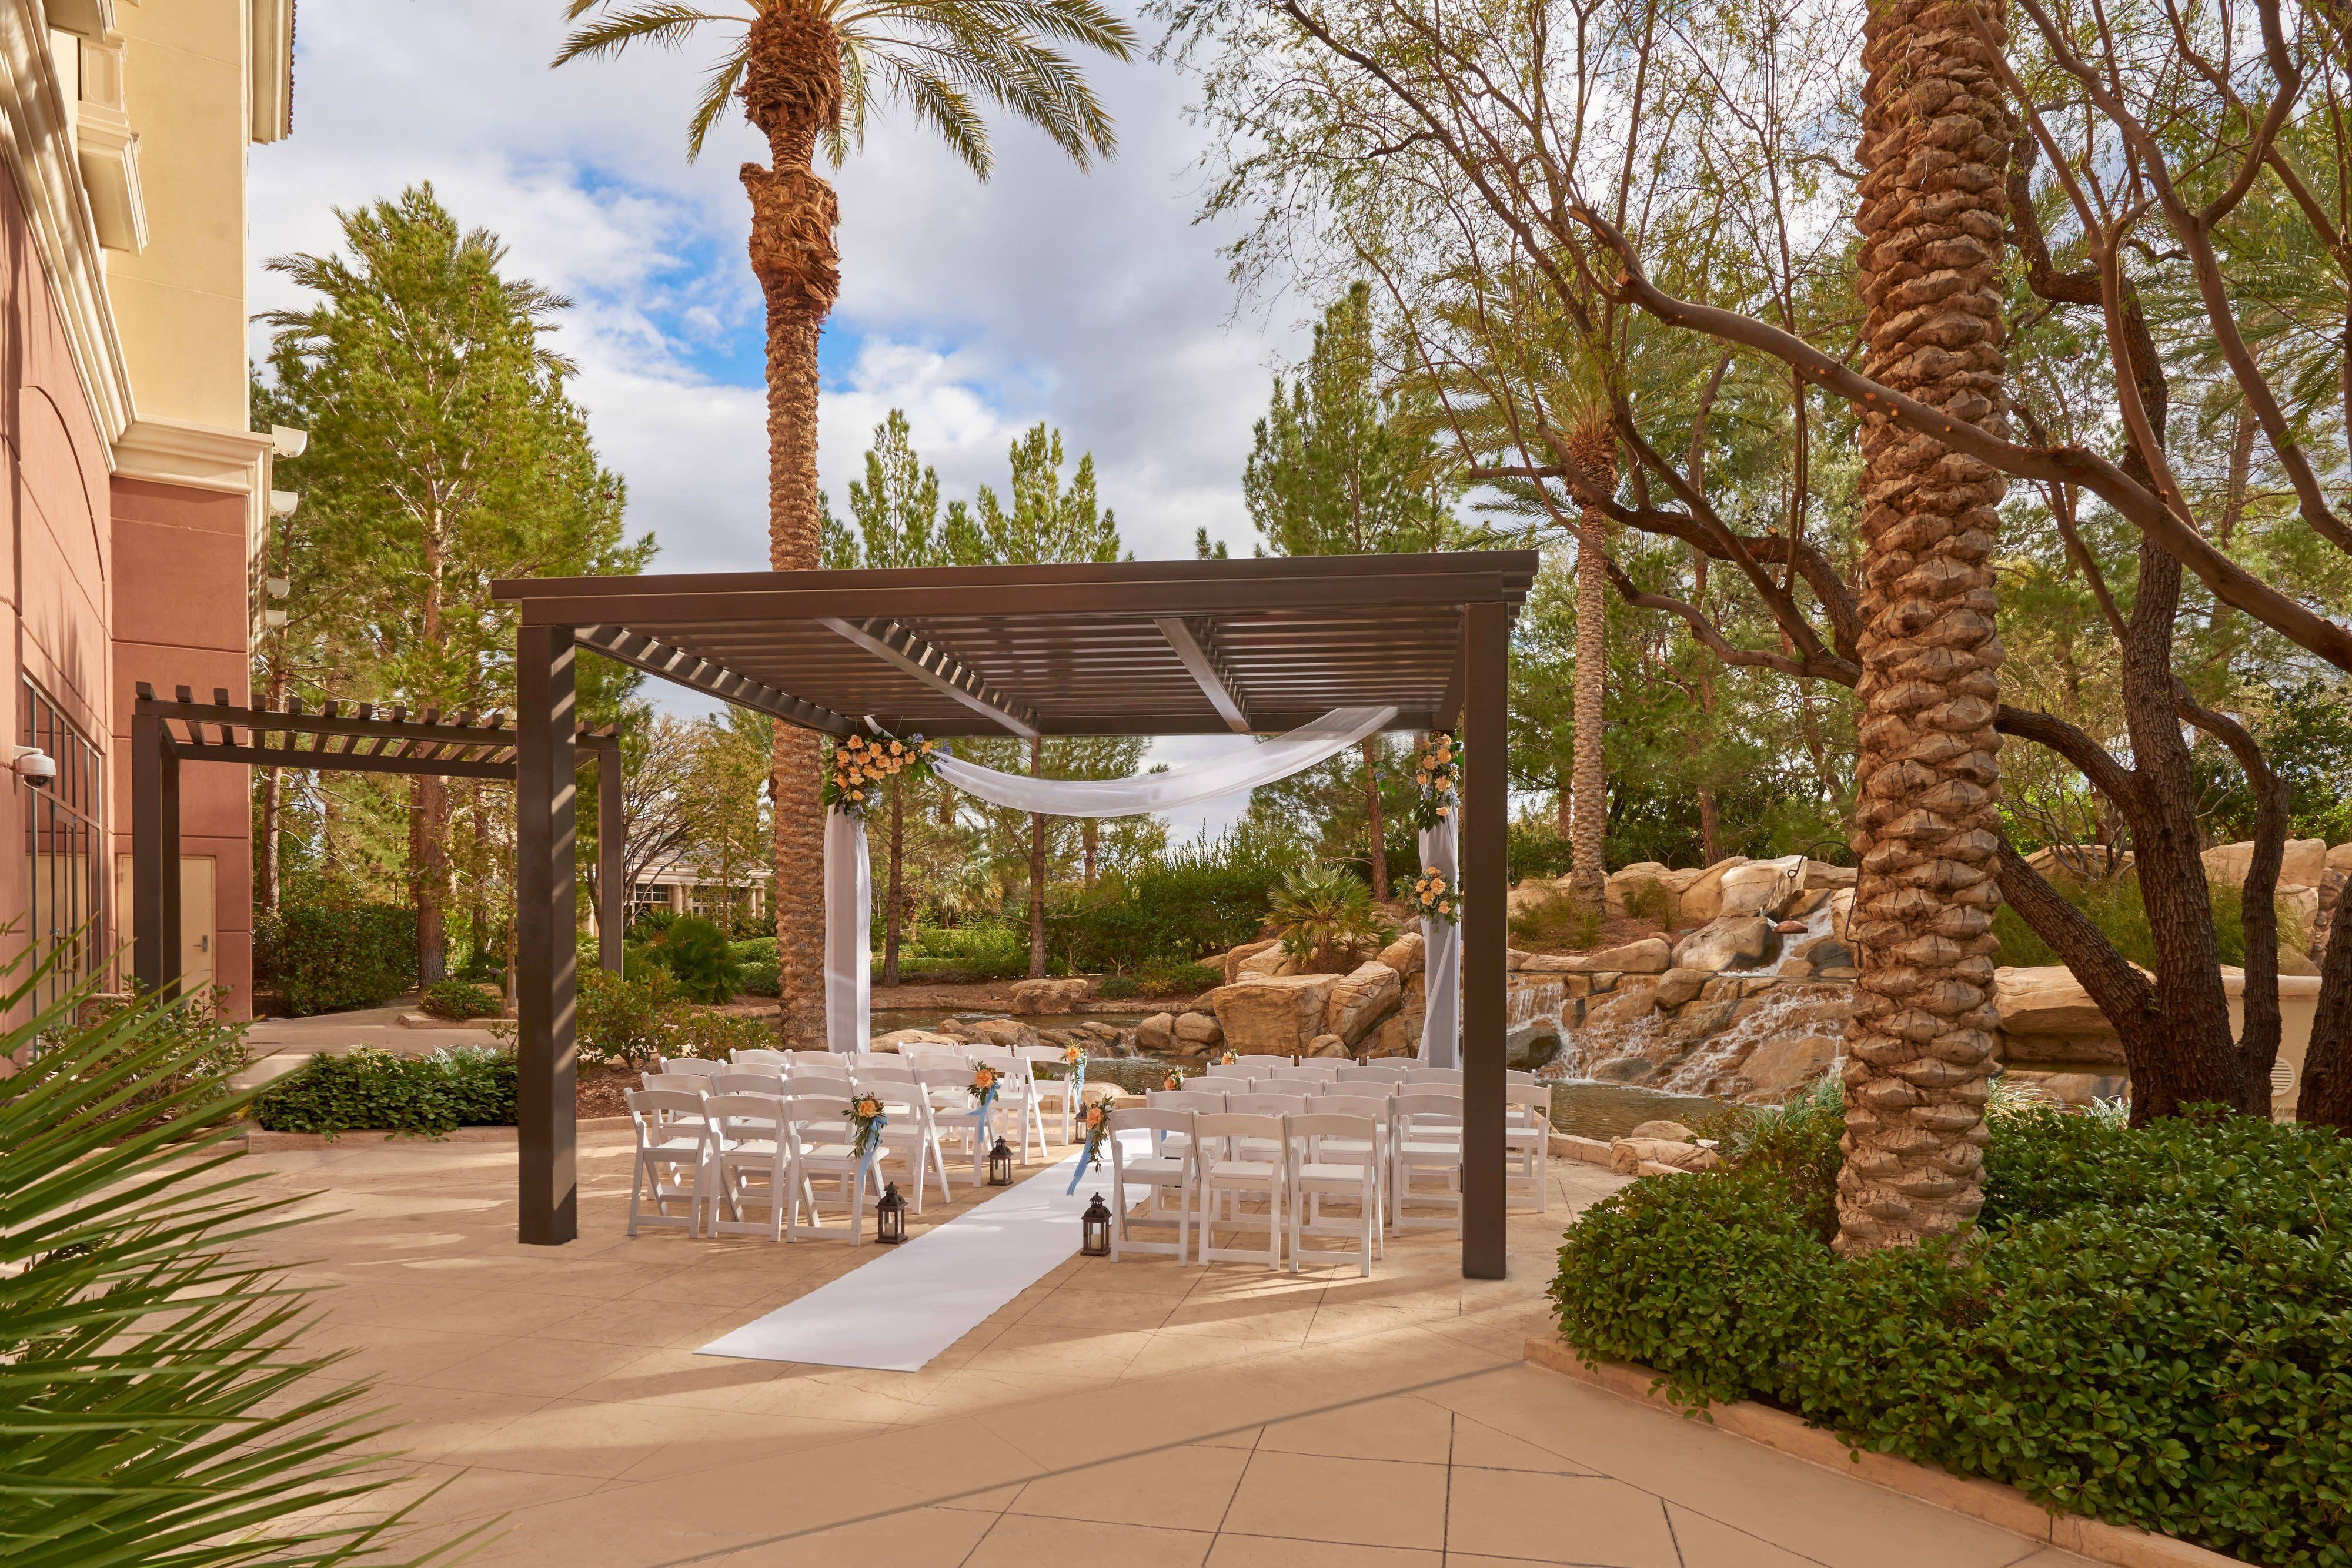 JW Marriott Las Vegas Resort | my love hotel | Pinterest | Las vegas ...